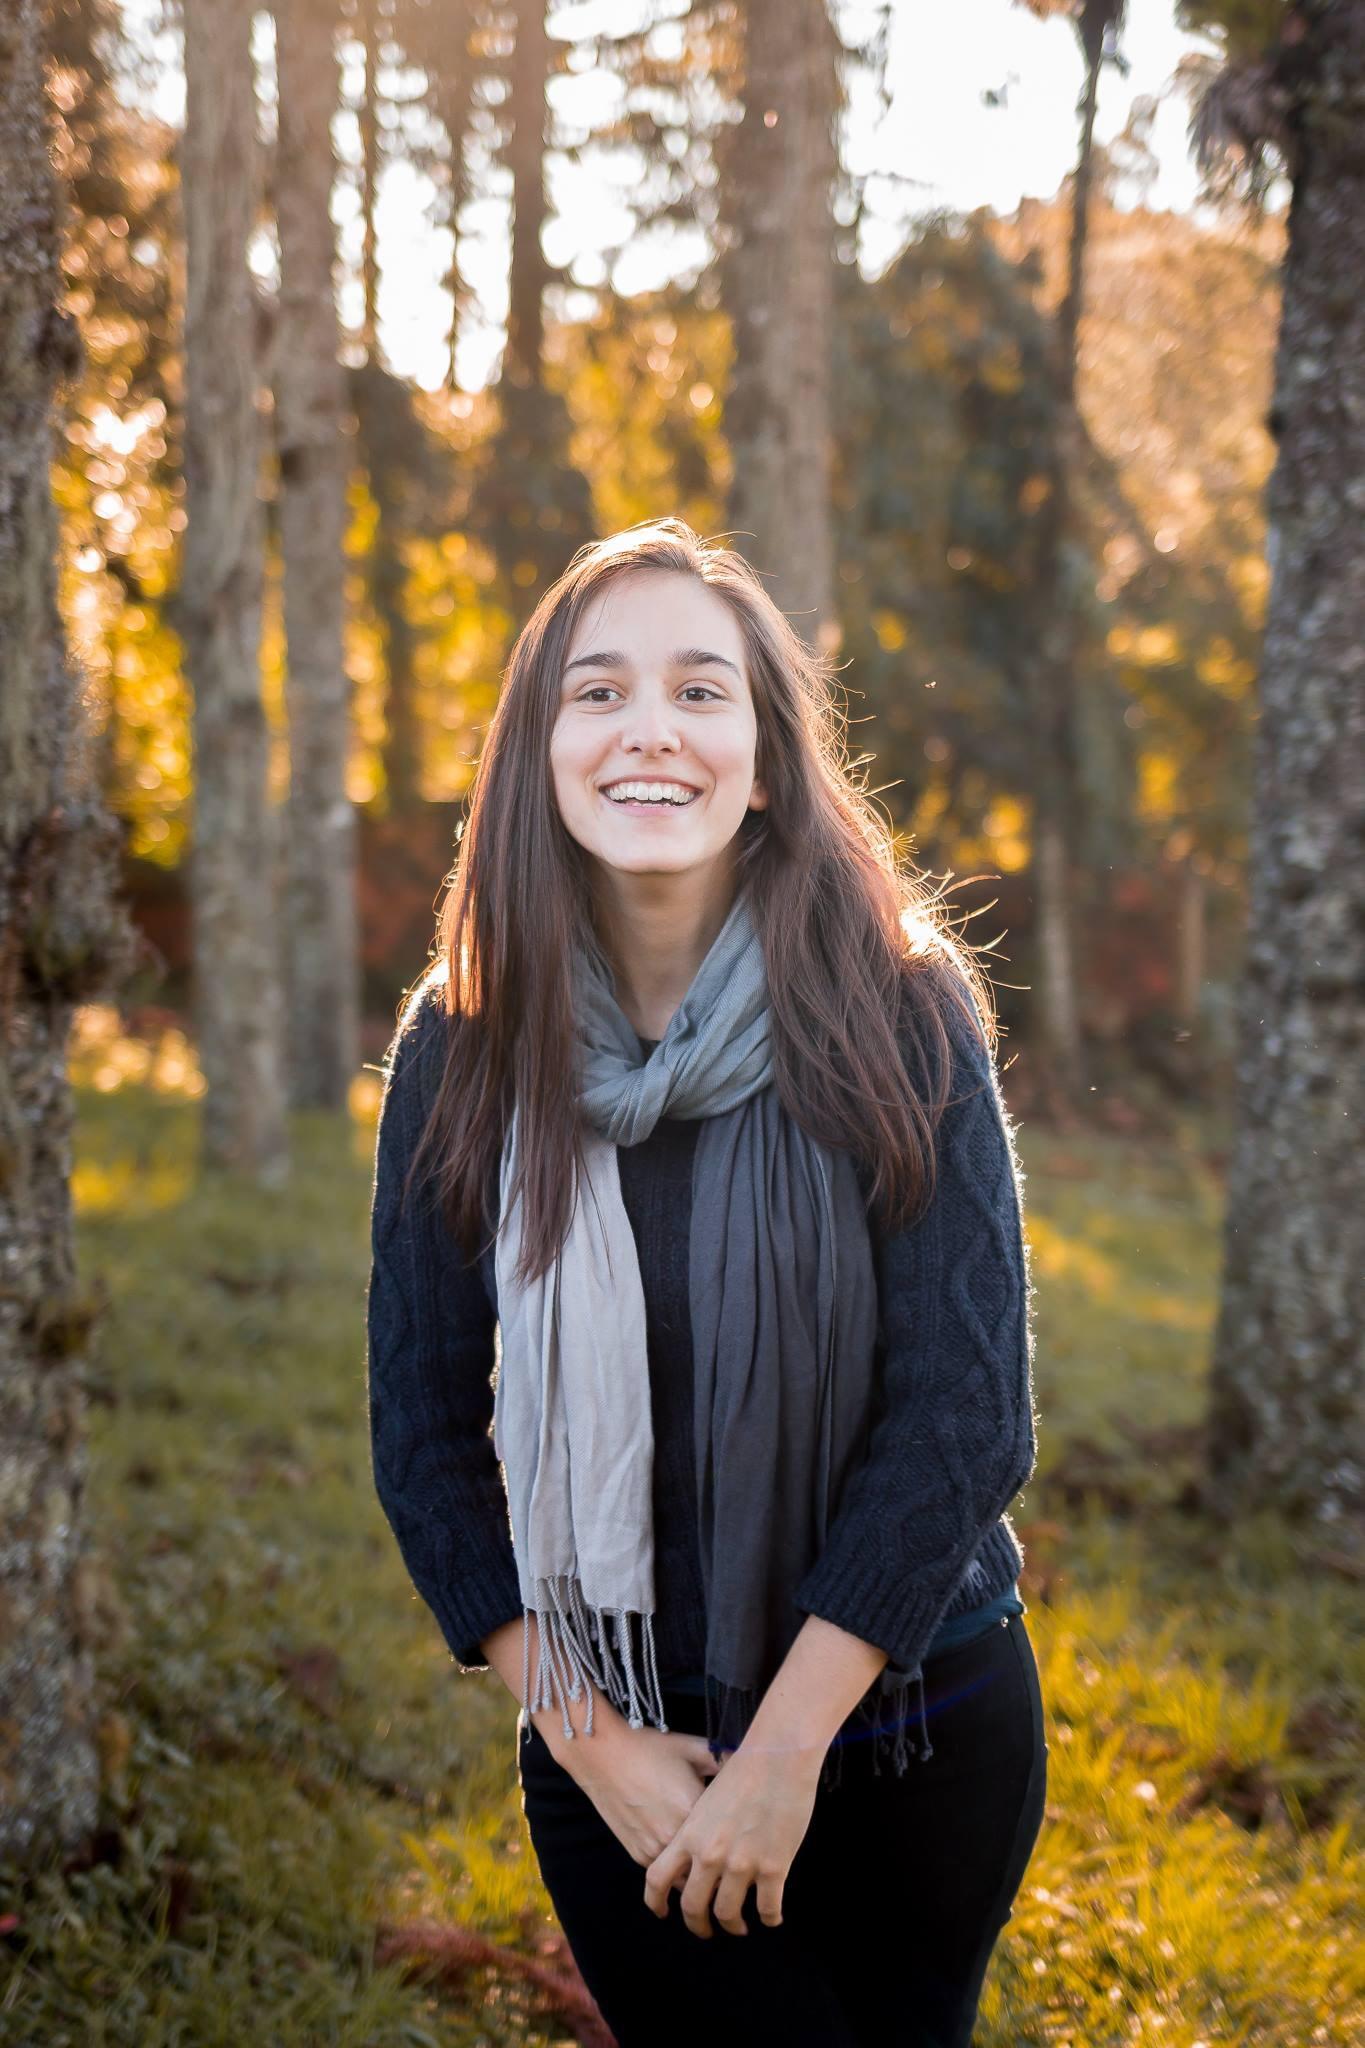 Go to Rebecca Villarinho's profile